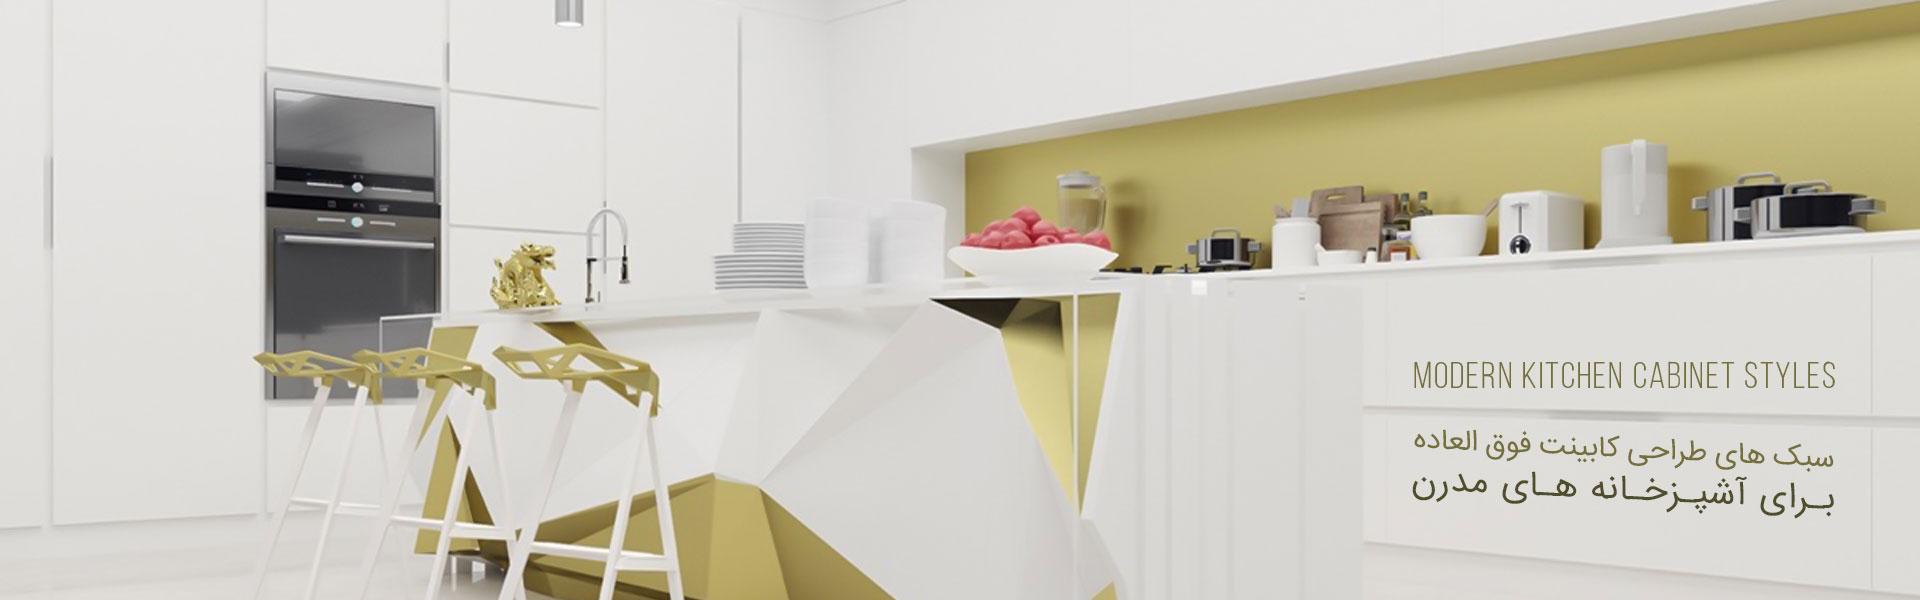 تصاویر سبک های طراحی کابینت